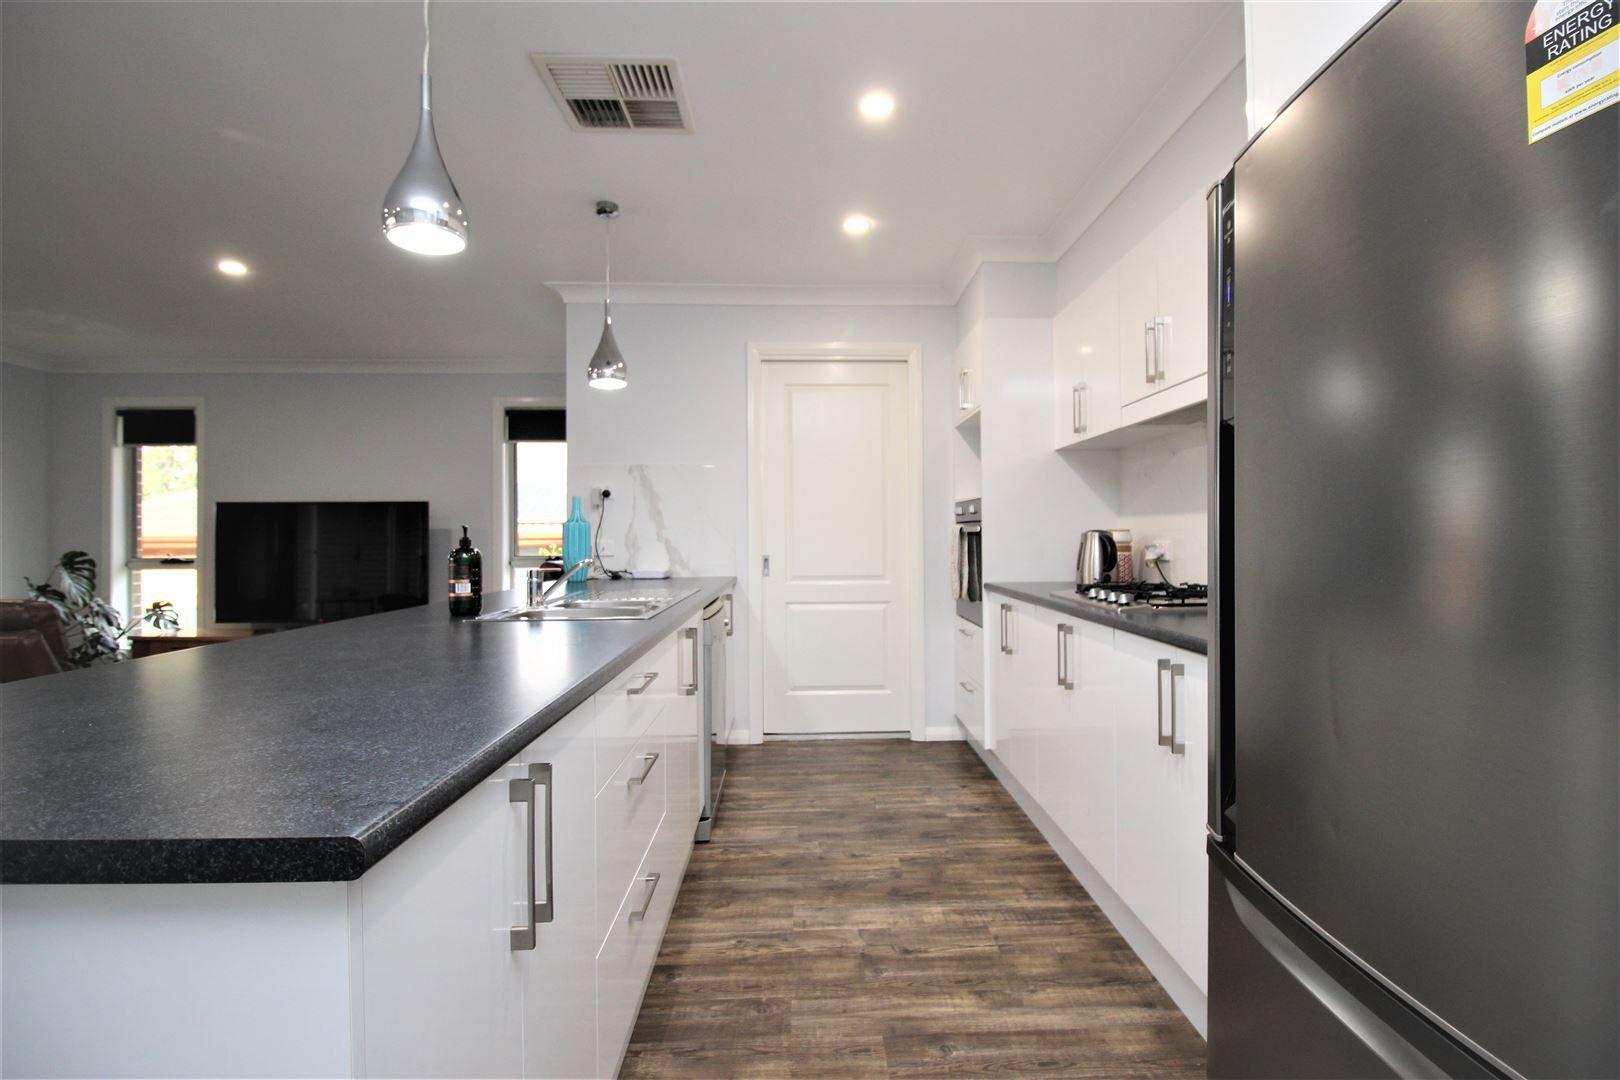 151 Hurley Street, Cootamundra NSW 2590, Image 1